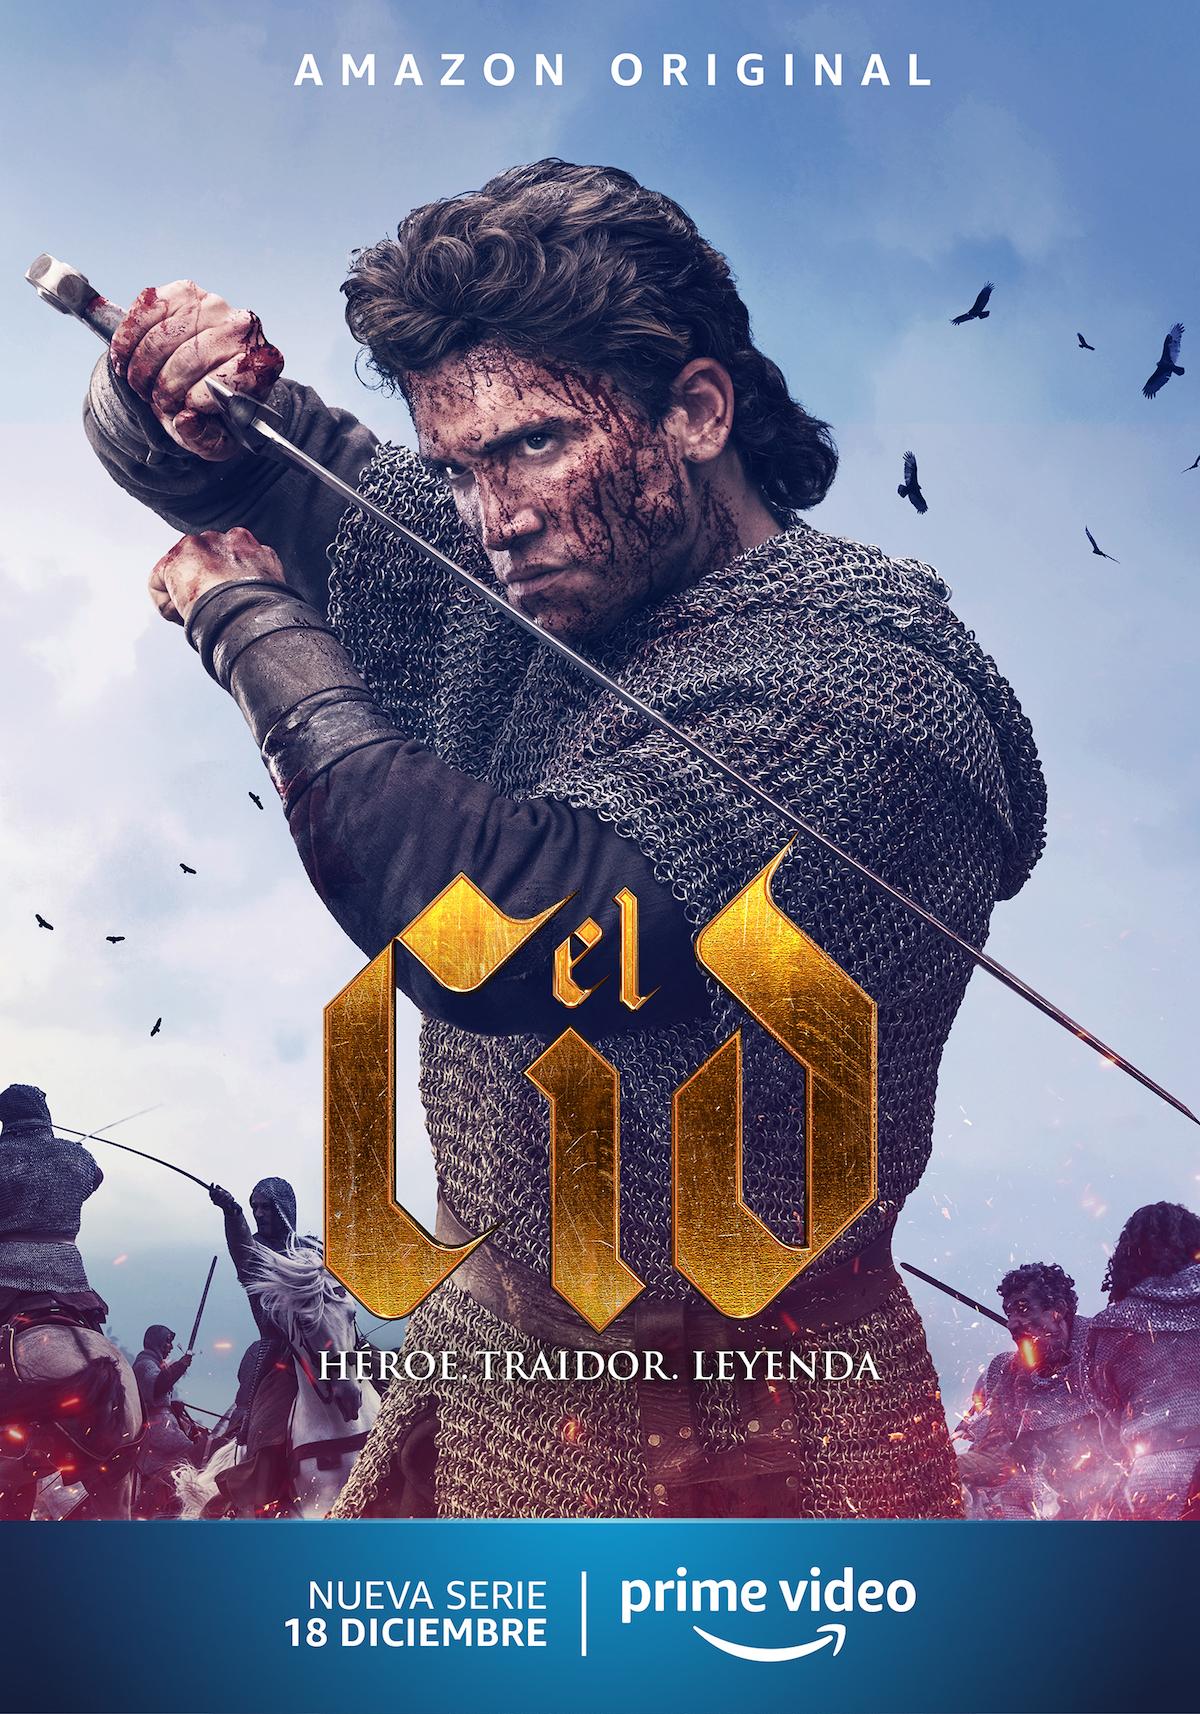 El Cid con Jaime Lorente arriverà a dicembre su Prime Video